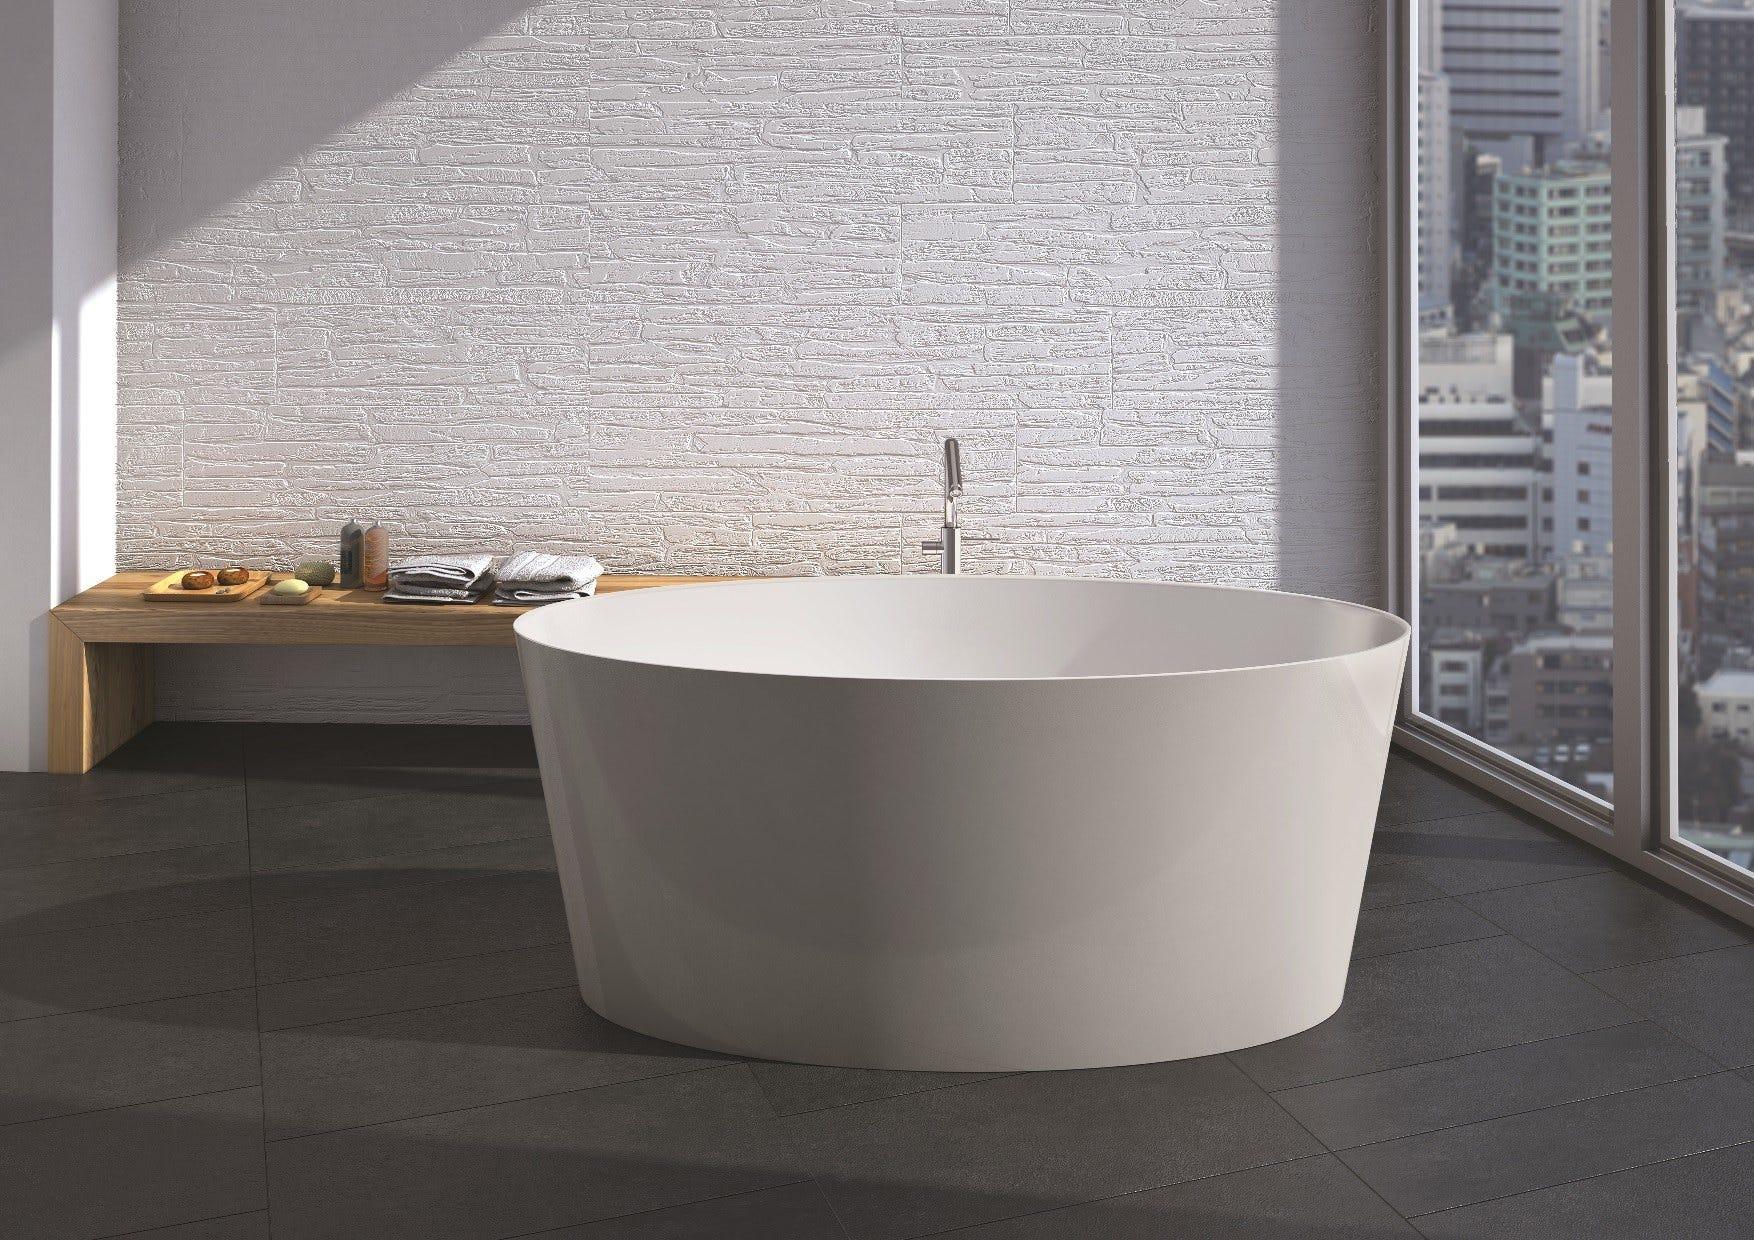 Vasca Da Bagno In Stile Inglese : Le novità di olympia per il cersaie nuova vasca da bagno